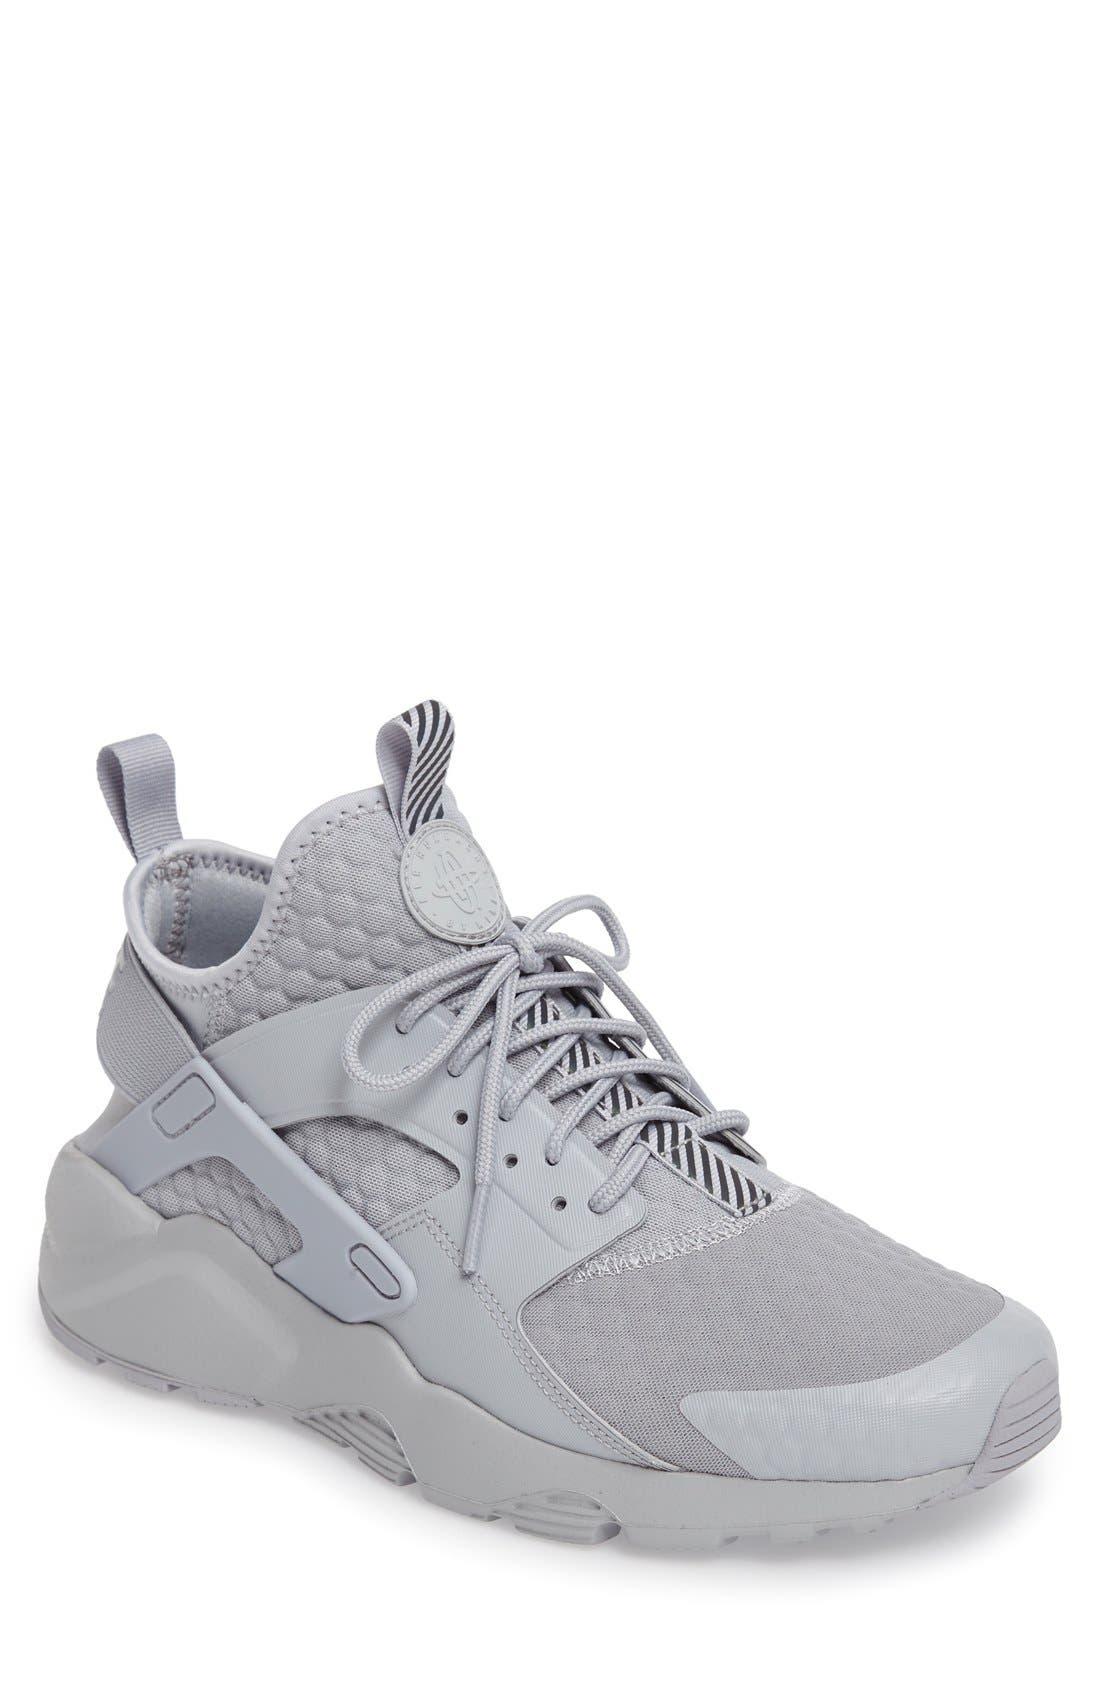 Alternate Image 1 Selected - Nike Huarache Run Ultra SE Premium Sneaker (Men)